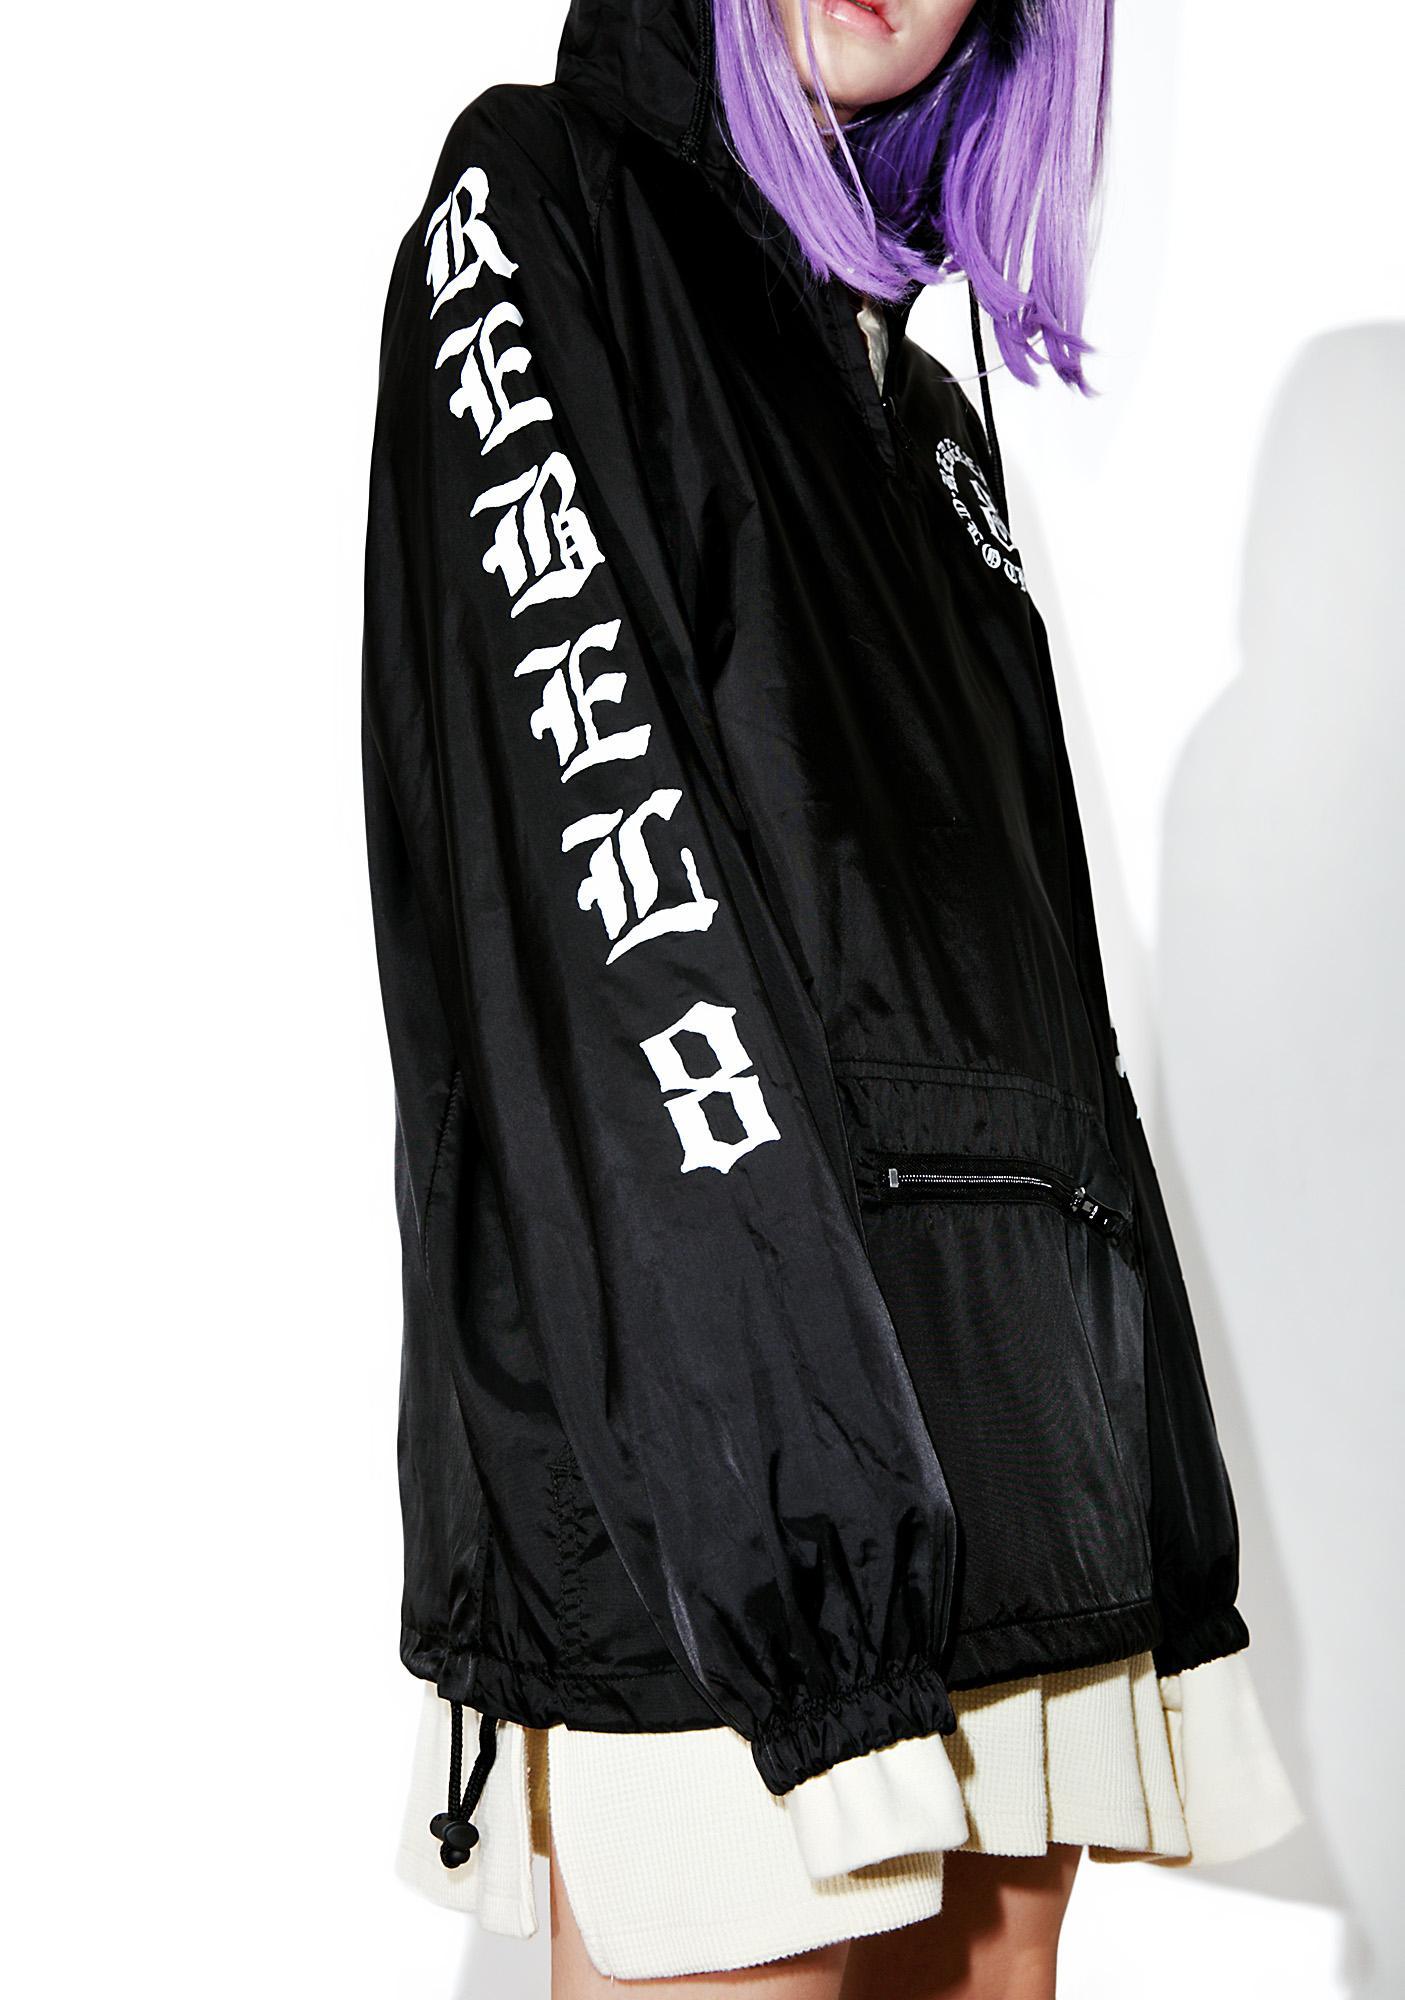 Rebel8 Immortals Black Anorak